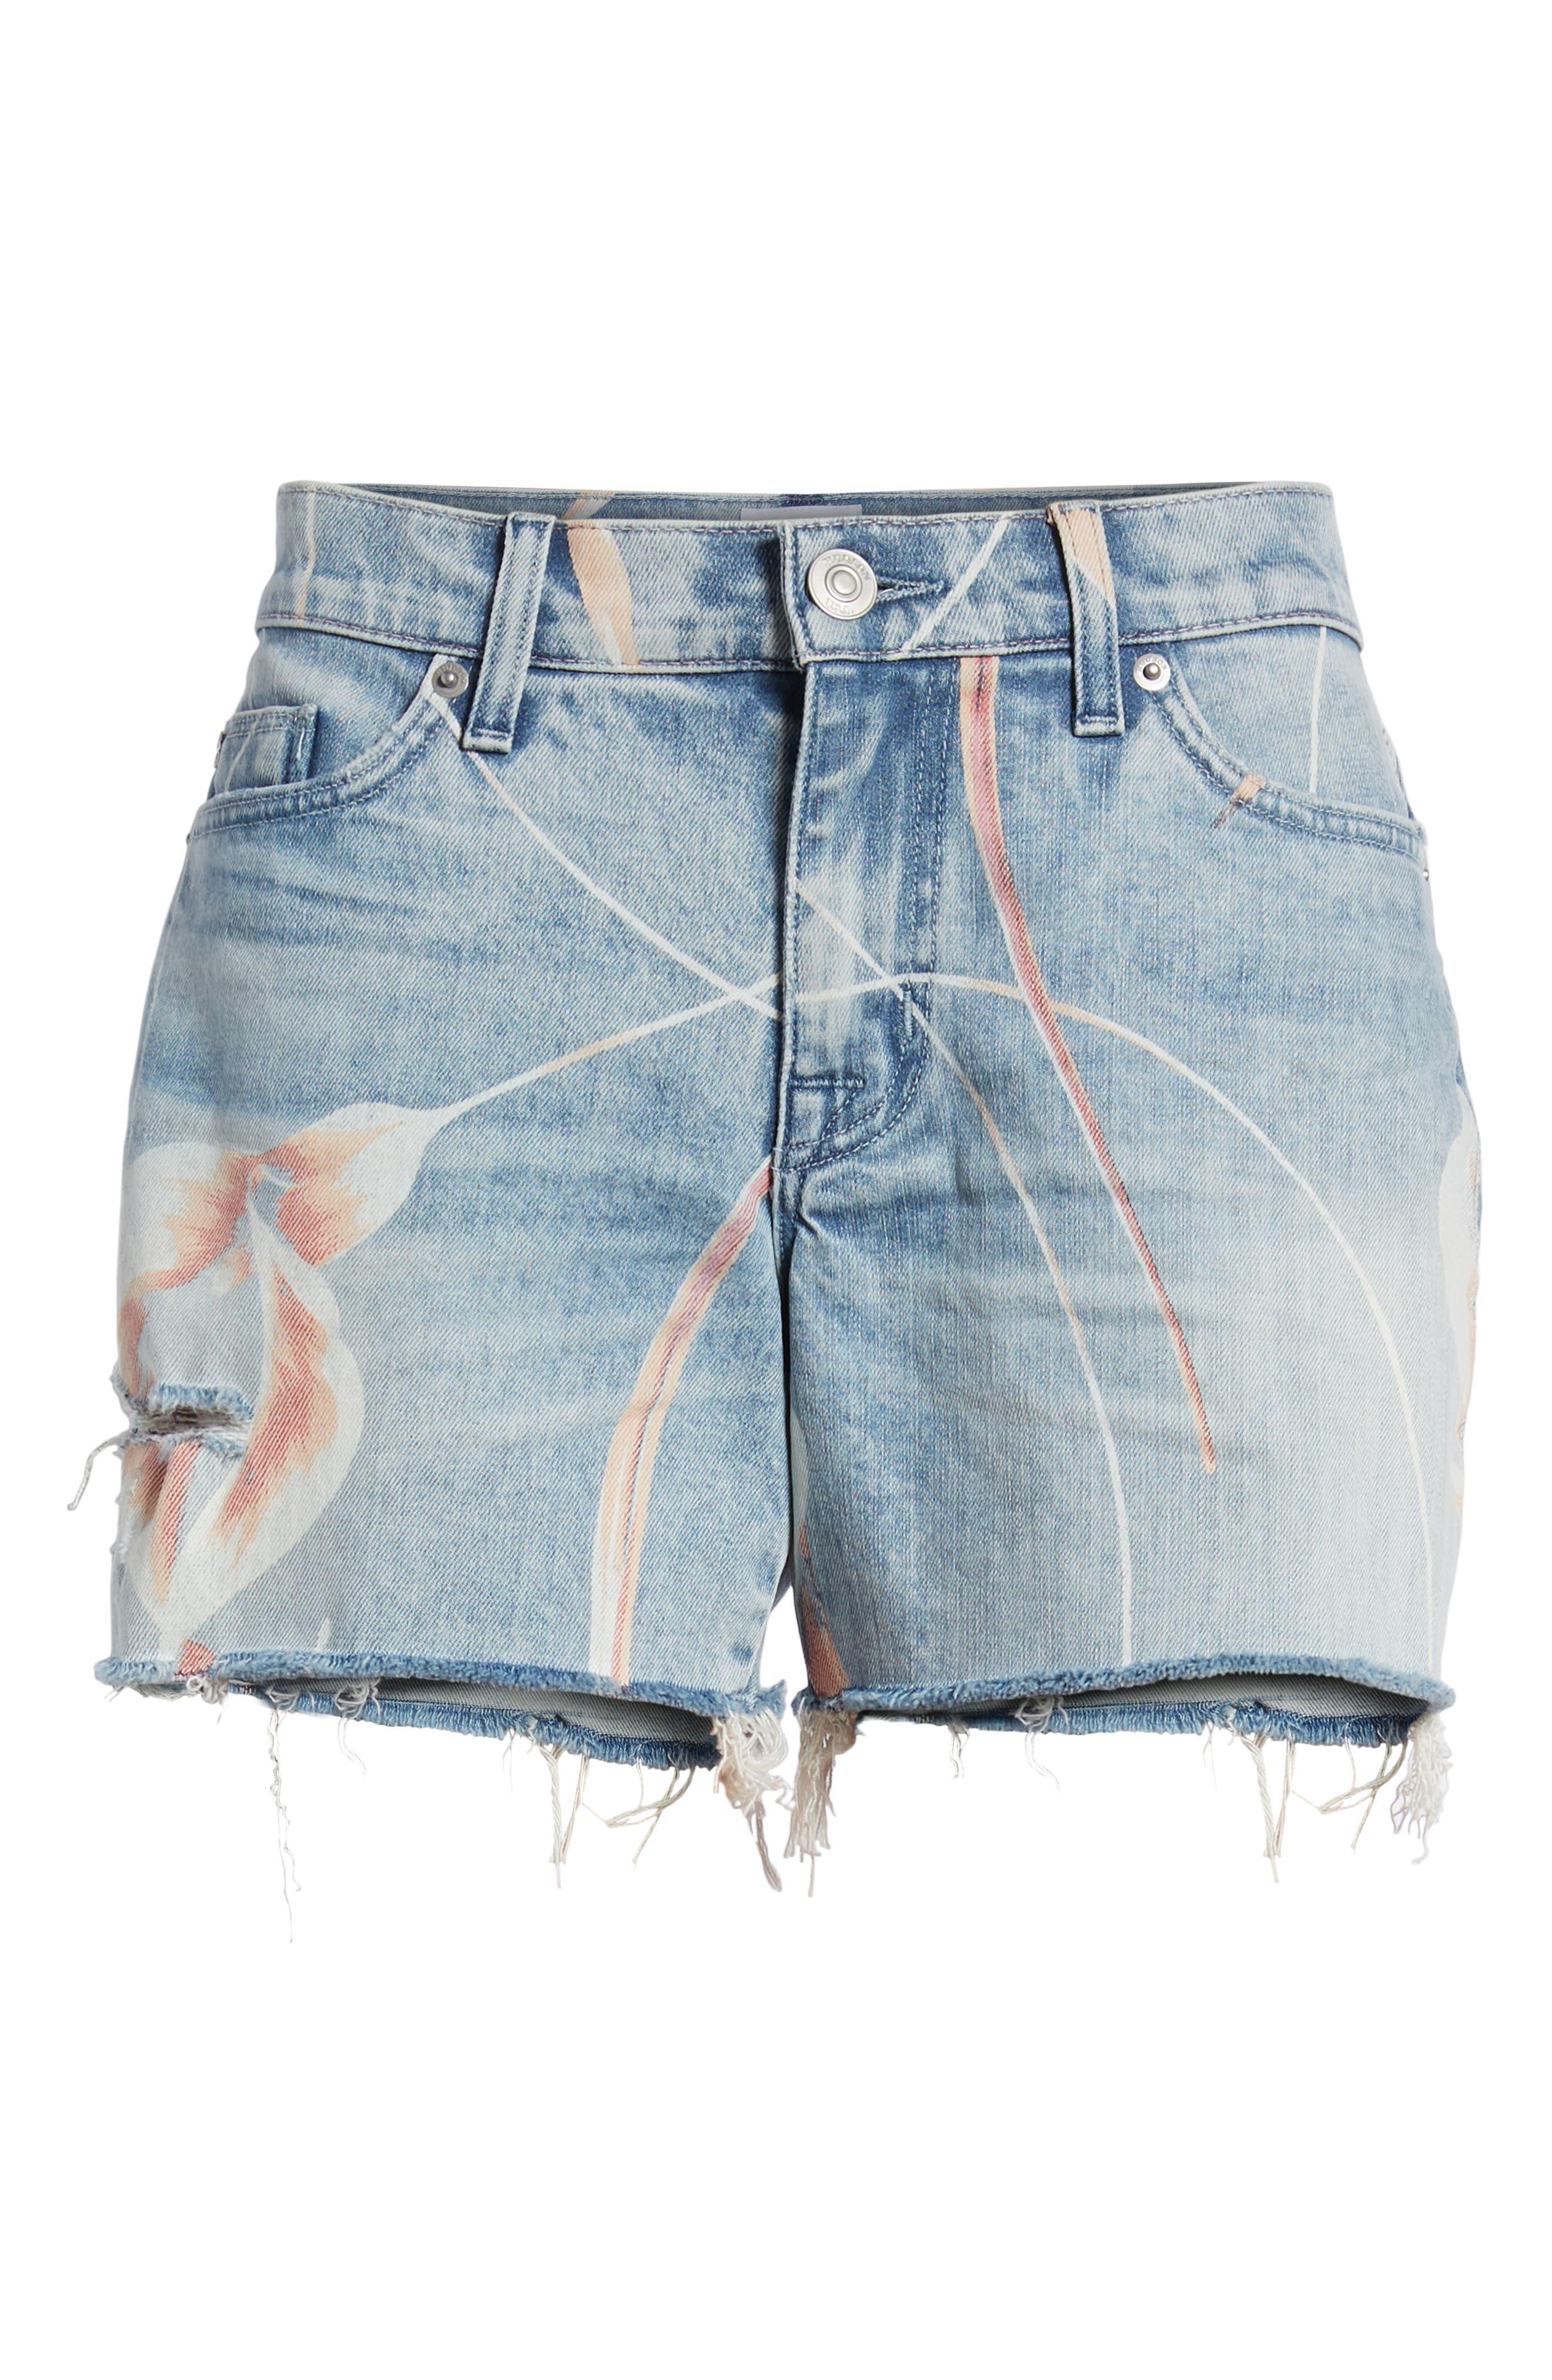 Valeri Painted Denim Shorts,                             Alternate thumbnail 7, color,                             001